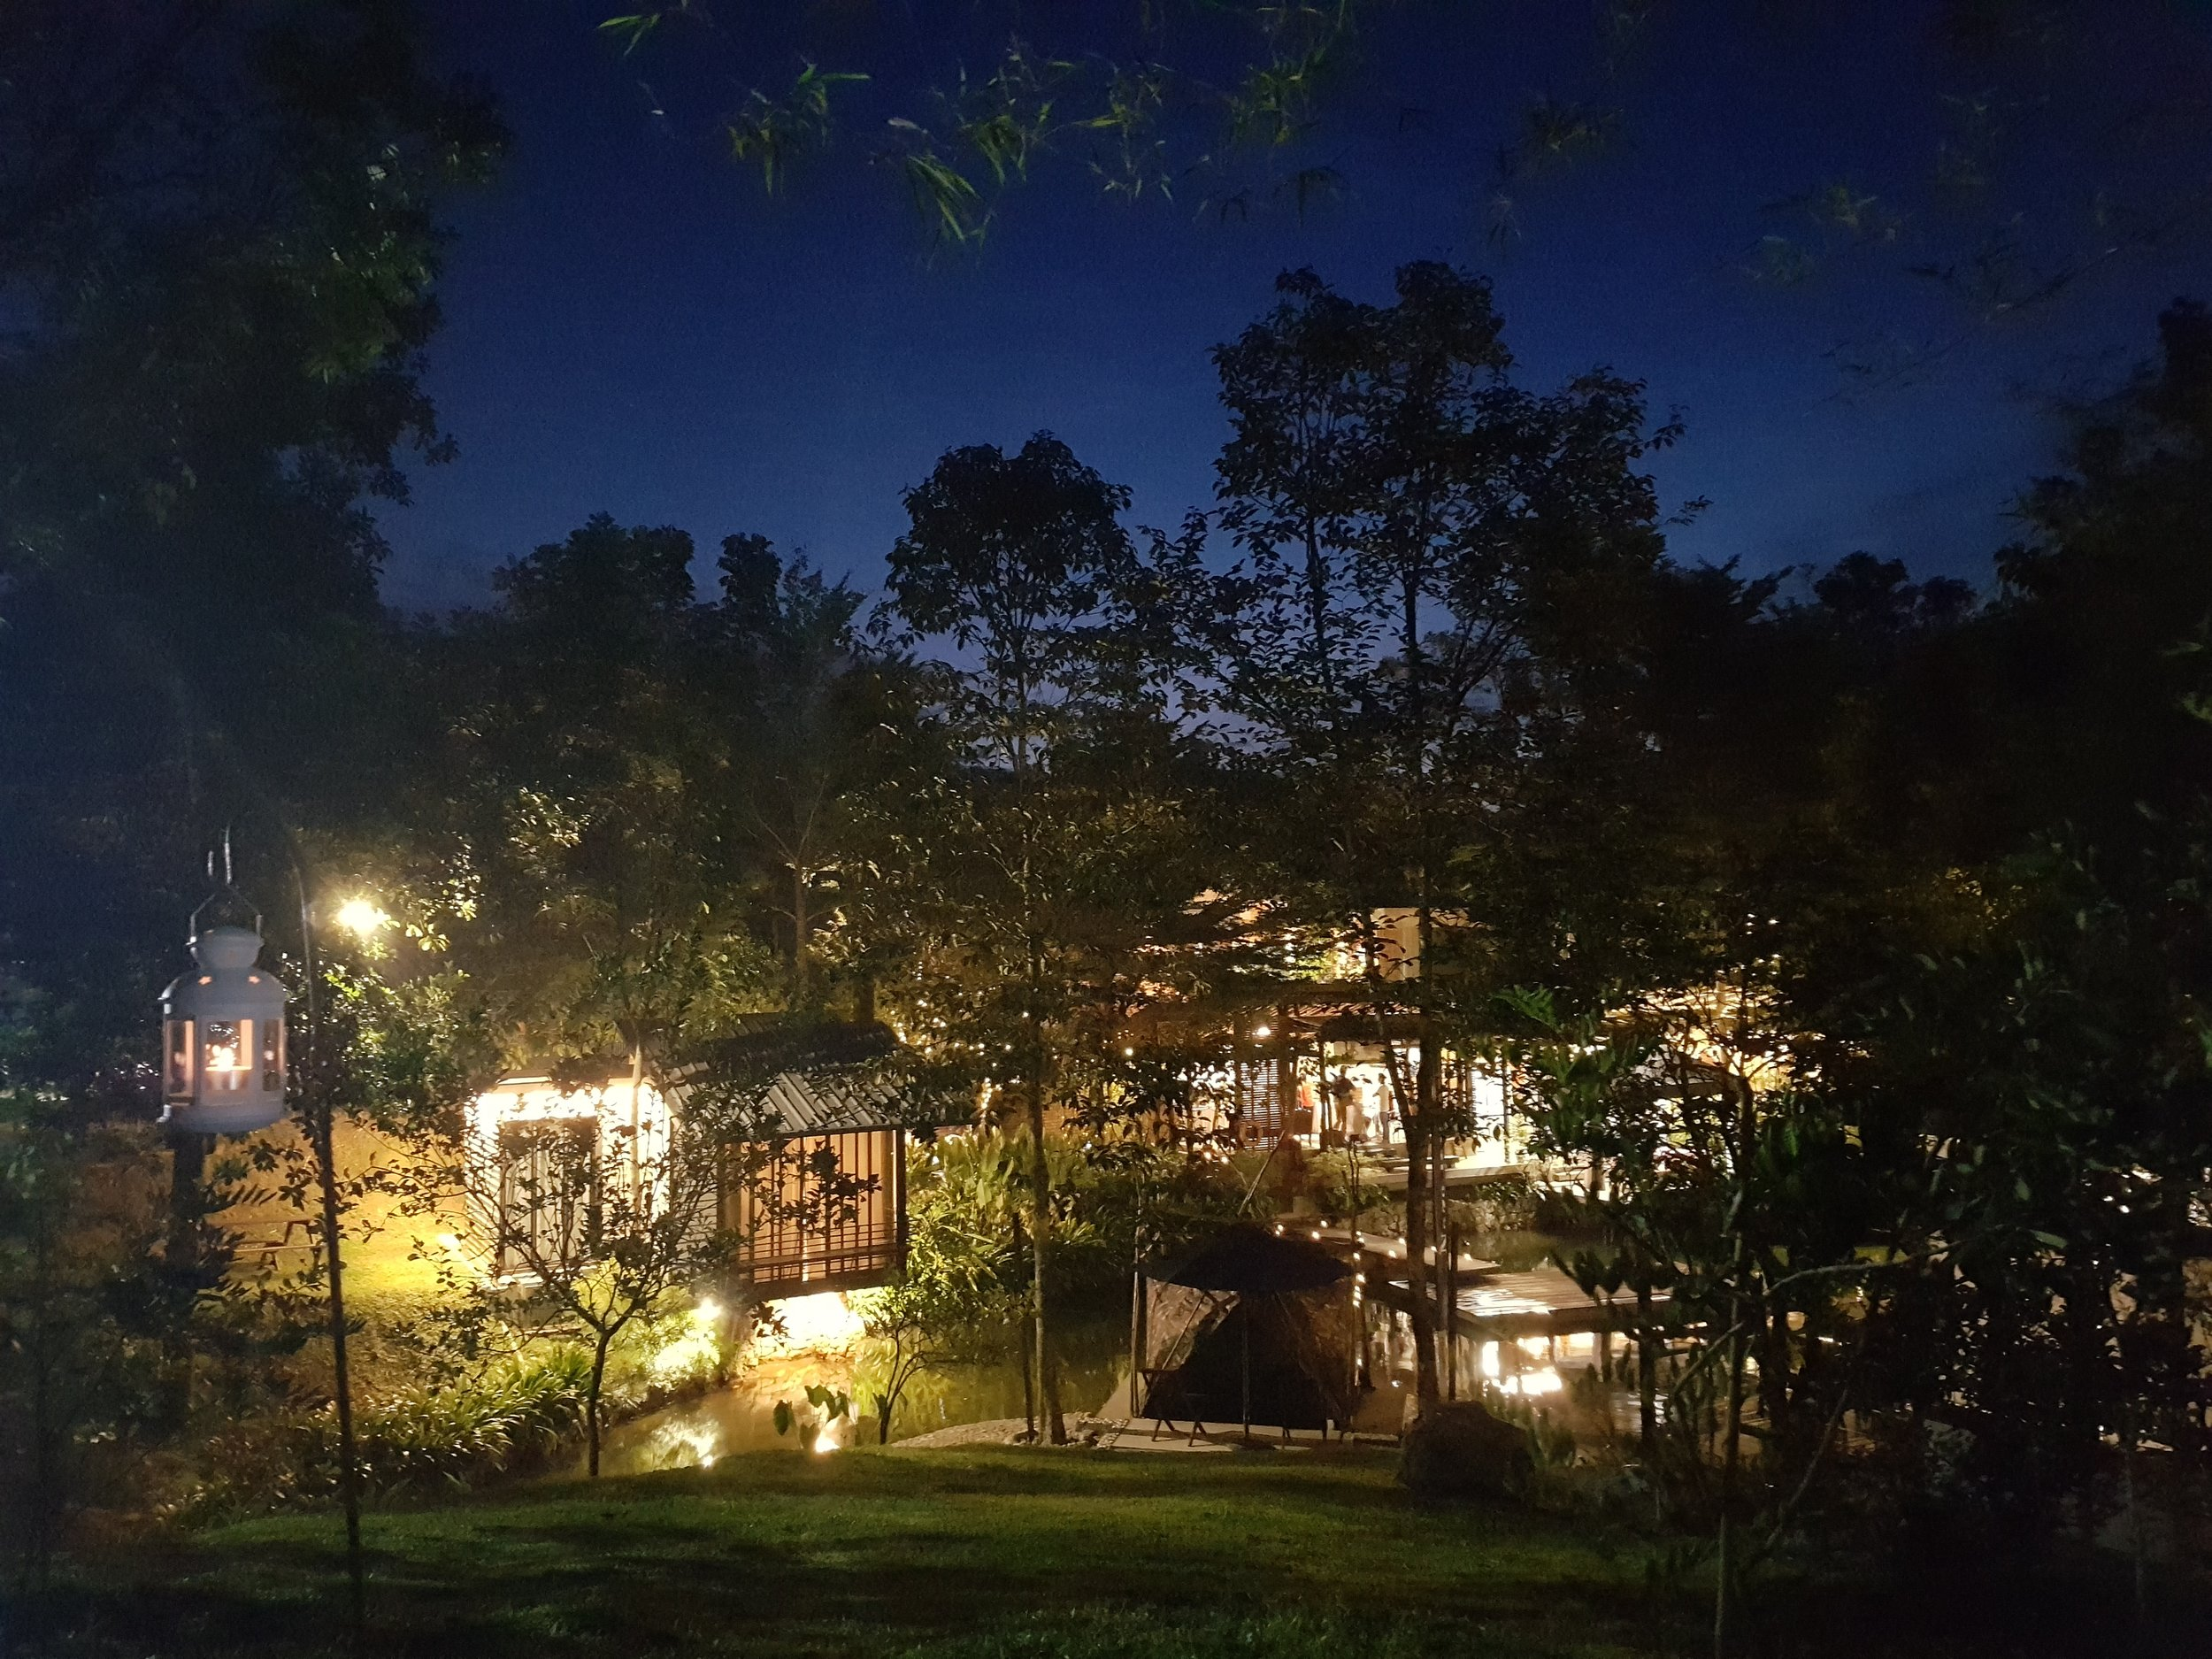 Dusun Raja Night Pic.jpg